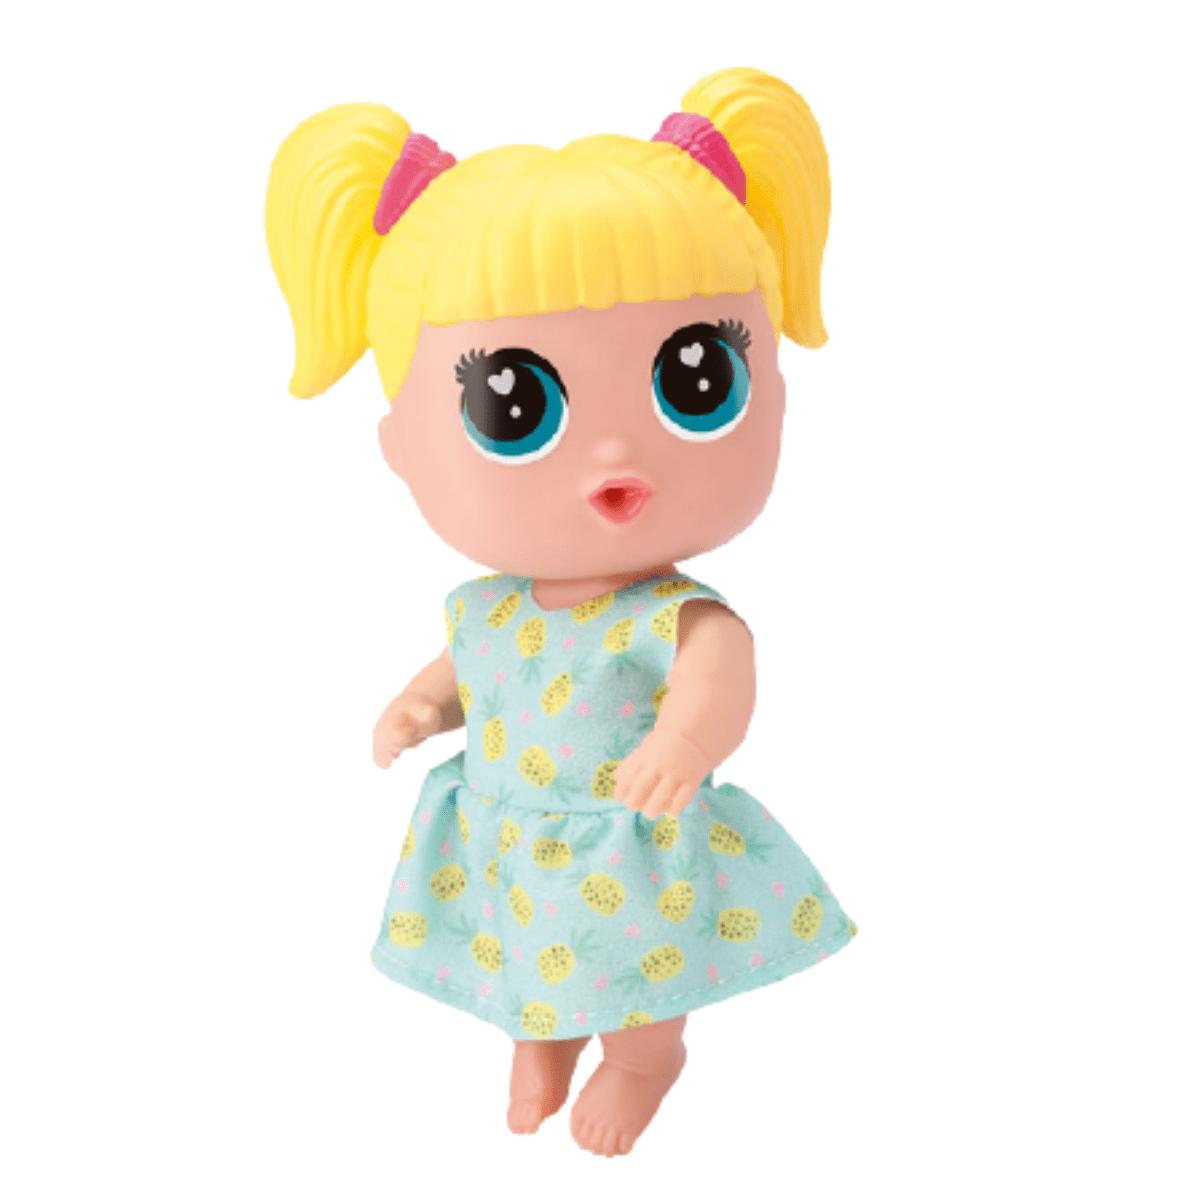 Boneca Baby Buddies Sabores - Abacaxi - Bambola